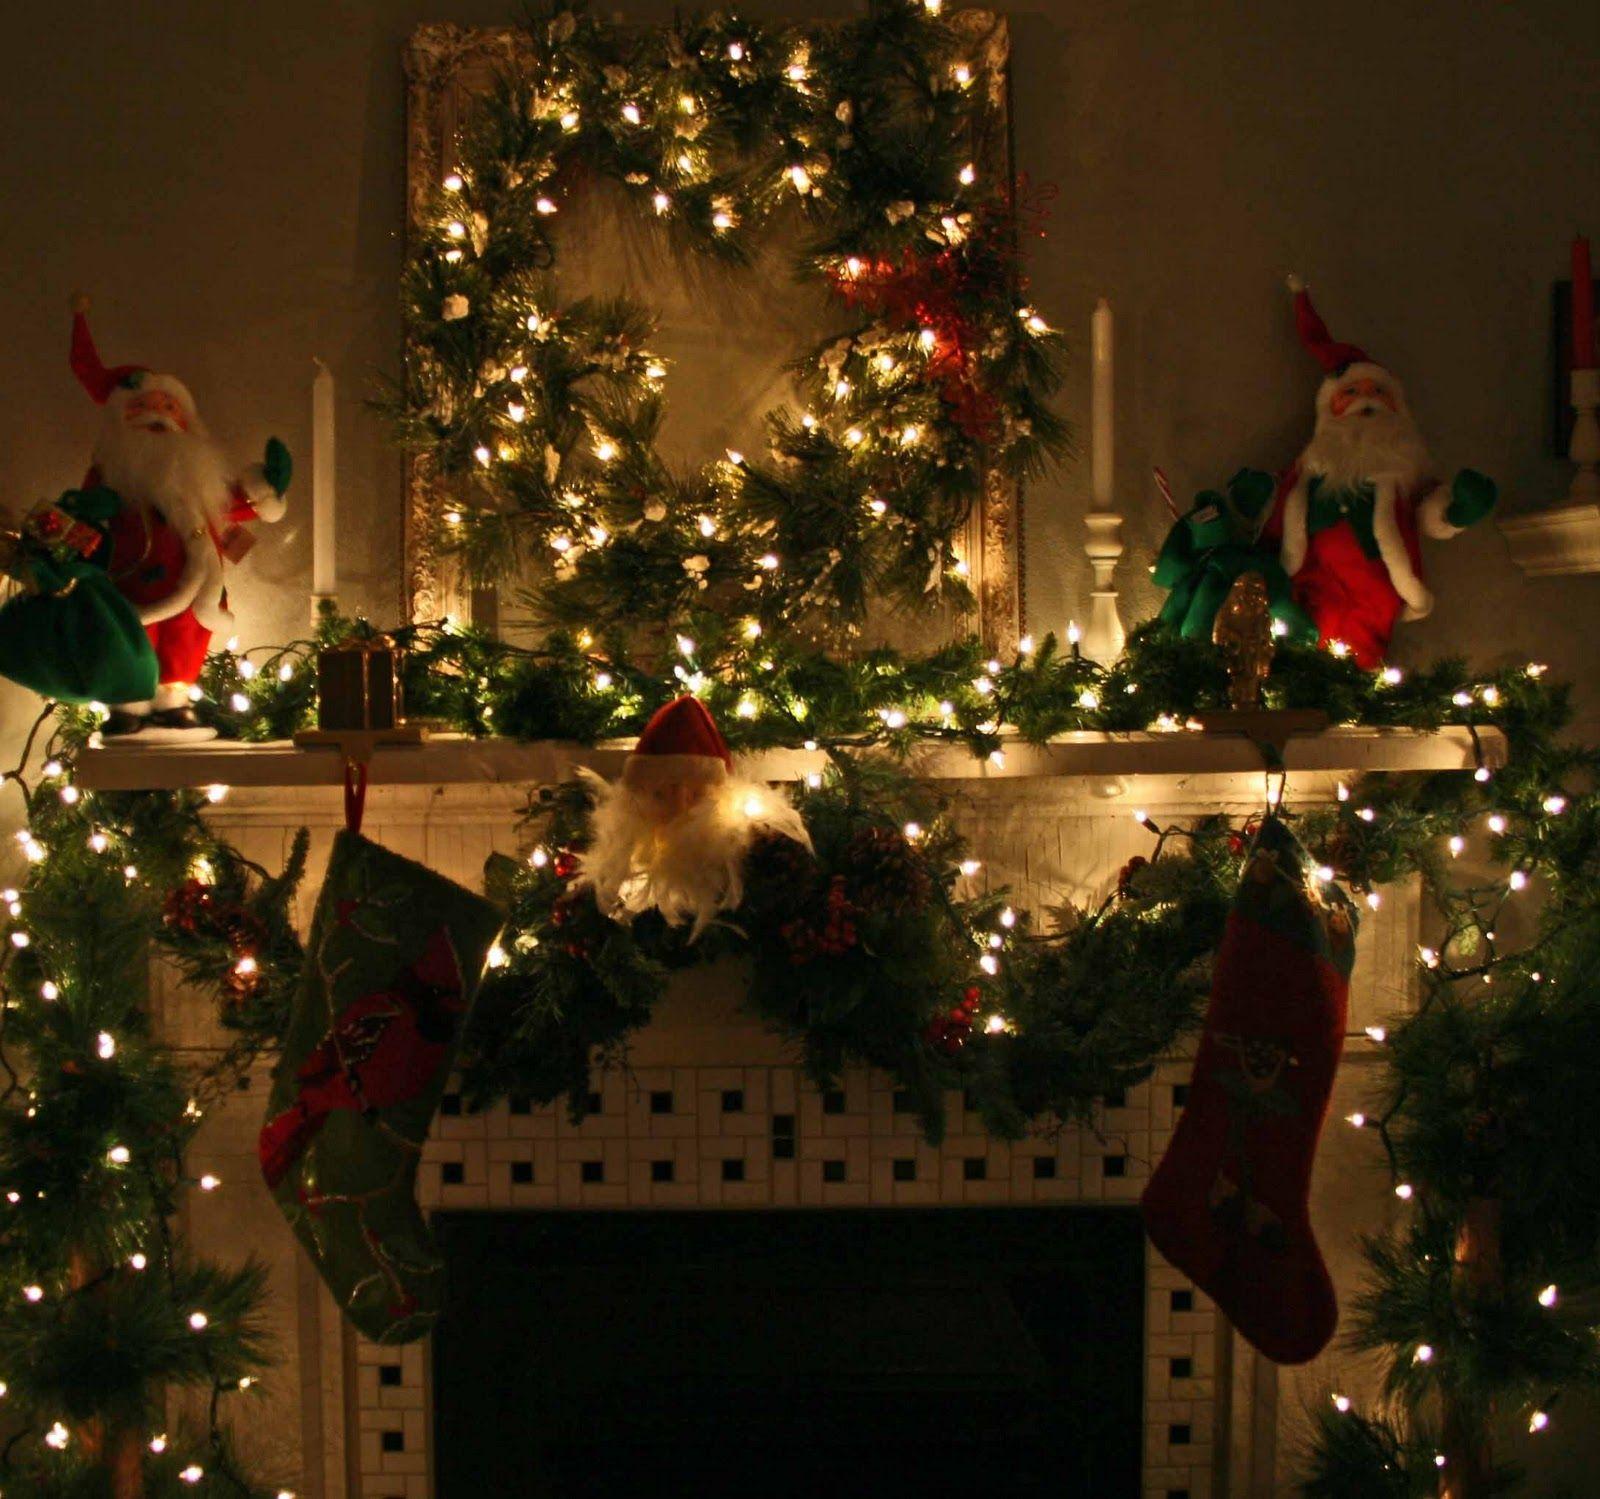 Christmas fireplace fire holiday festive decorations 5 wallpaper | 1600x1499 | 203860 | WallpaperUP